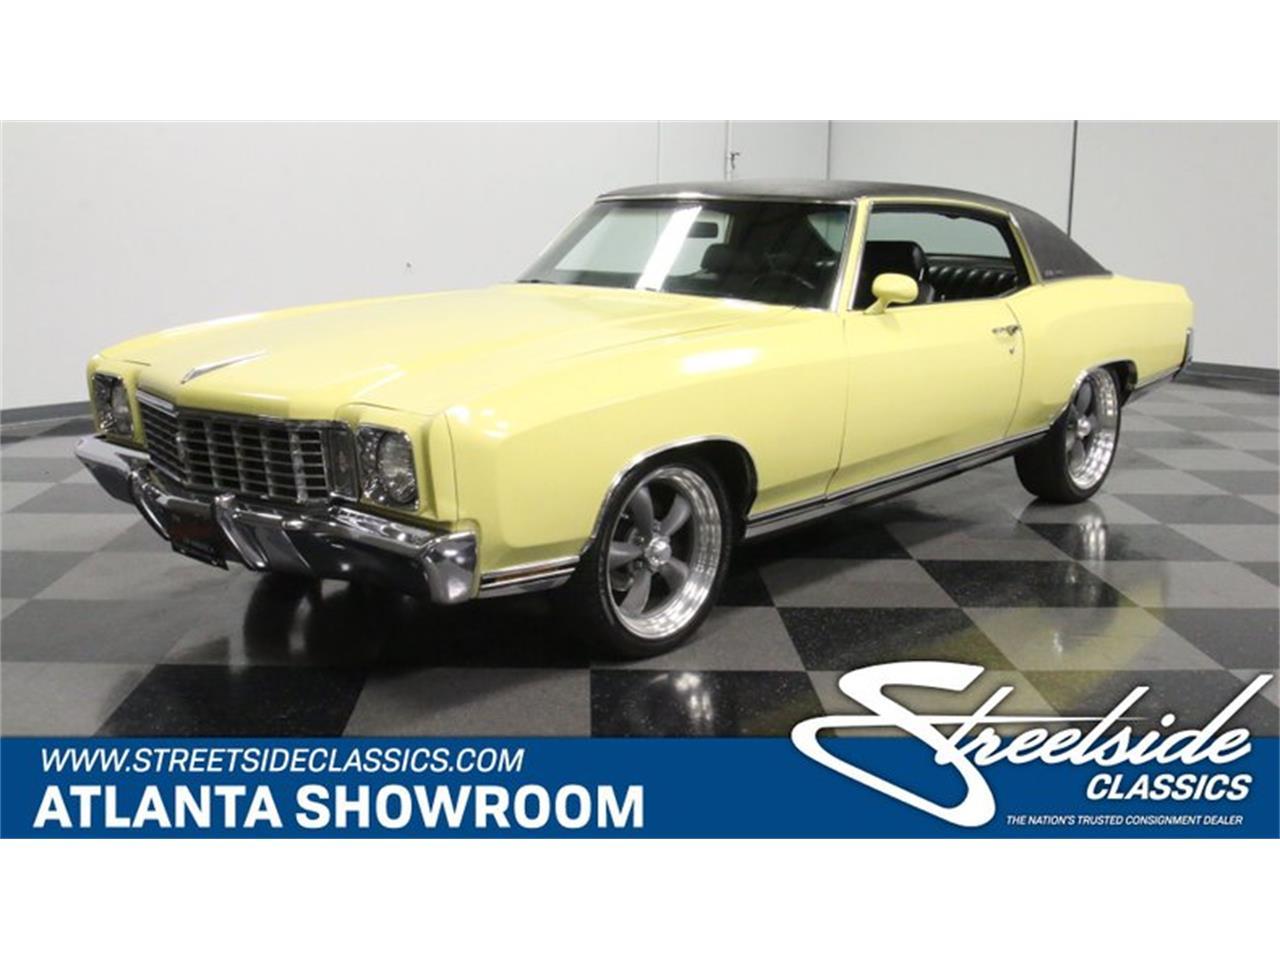 For Sale: 1972 Chevrolet Monte Carlo in Lithia Springs, Georgia